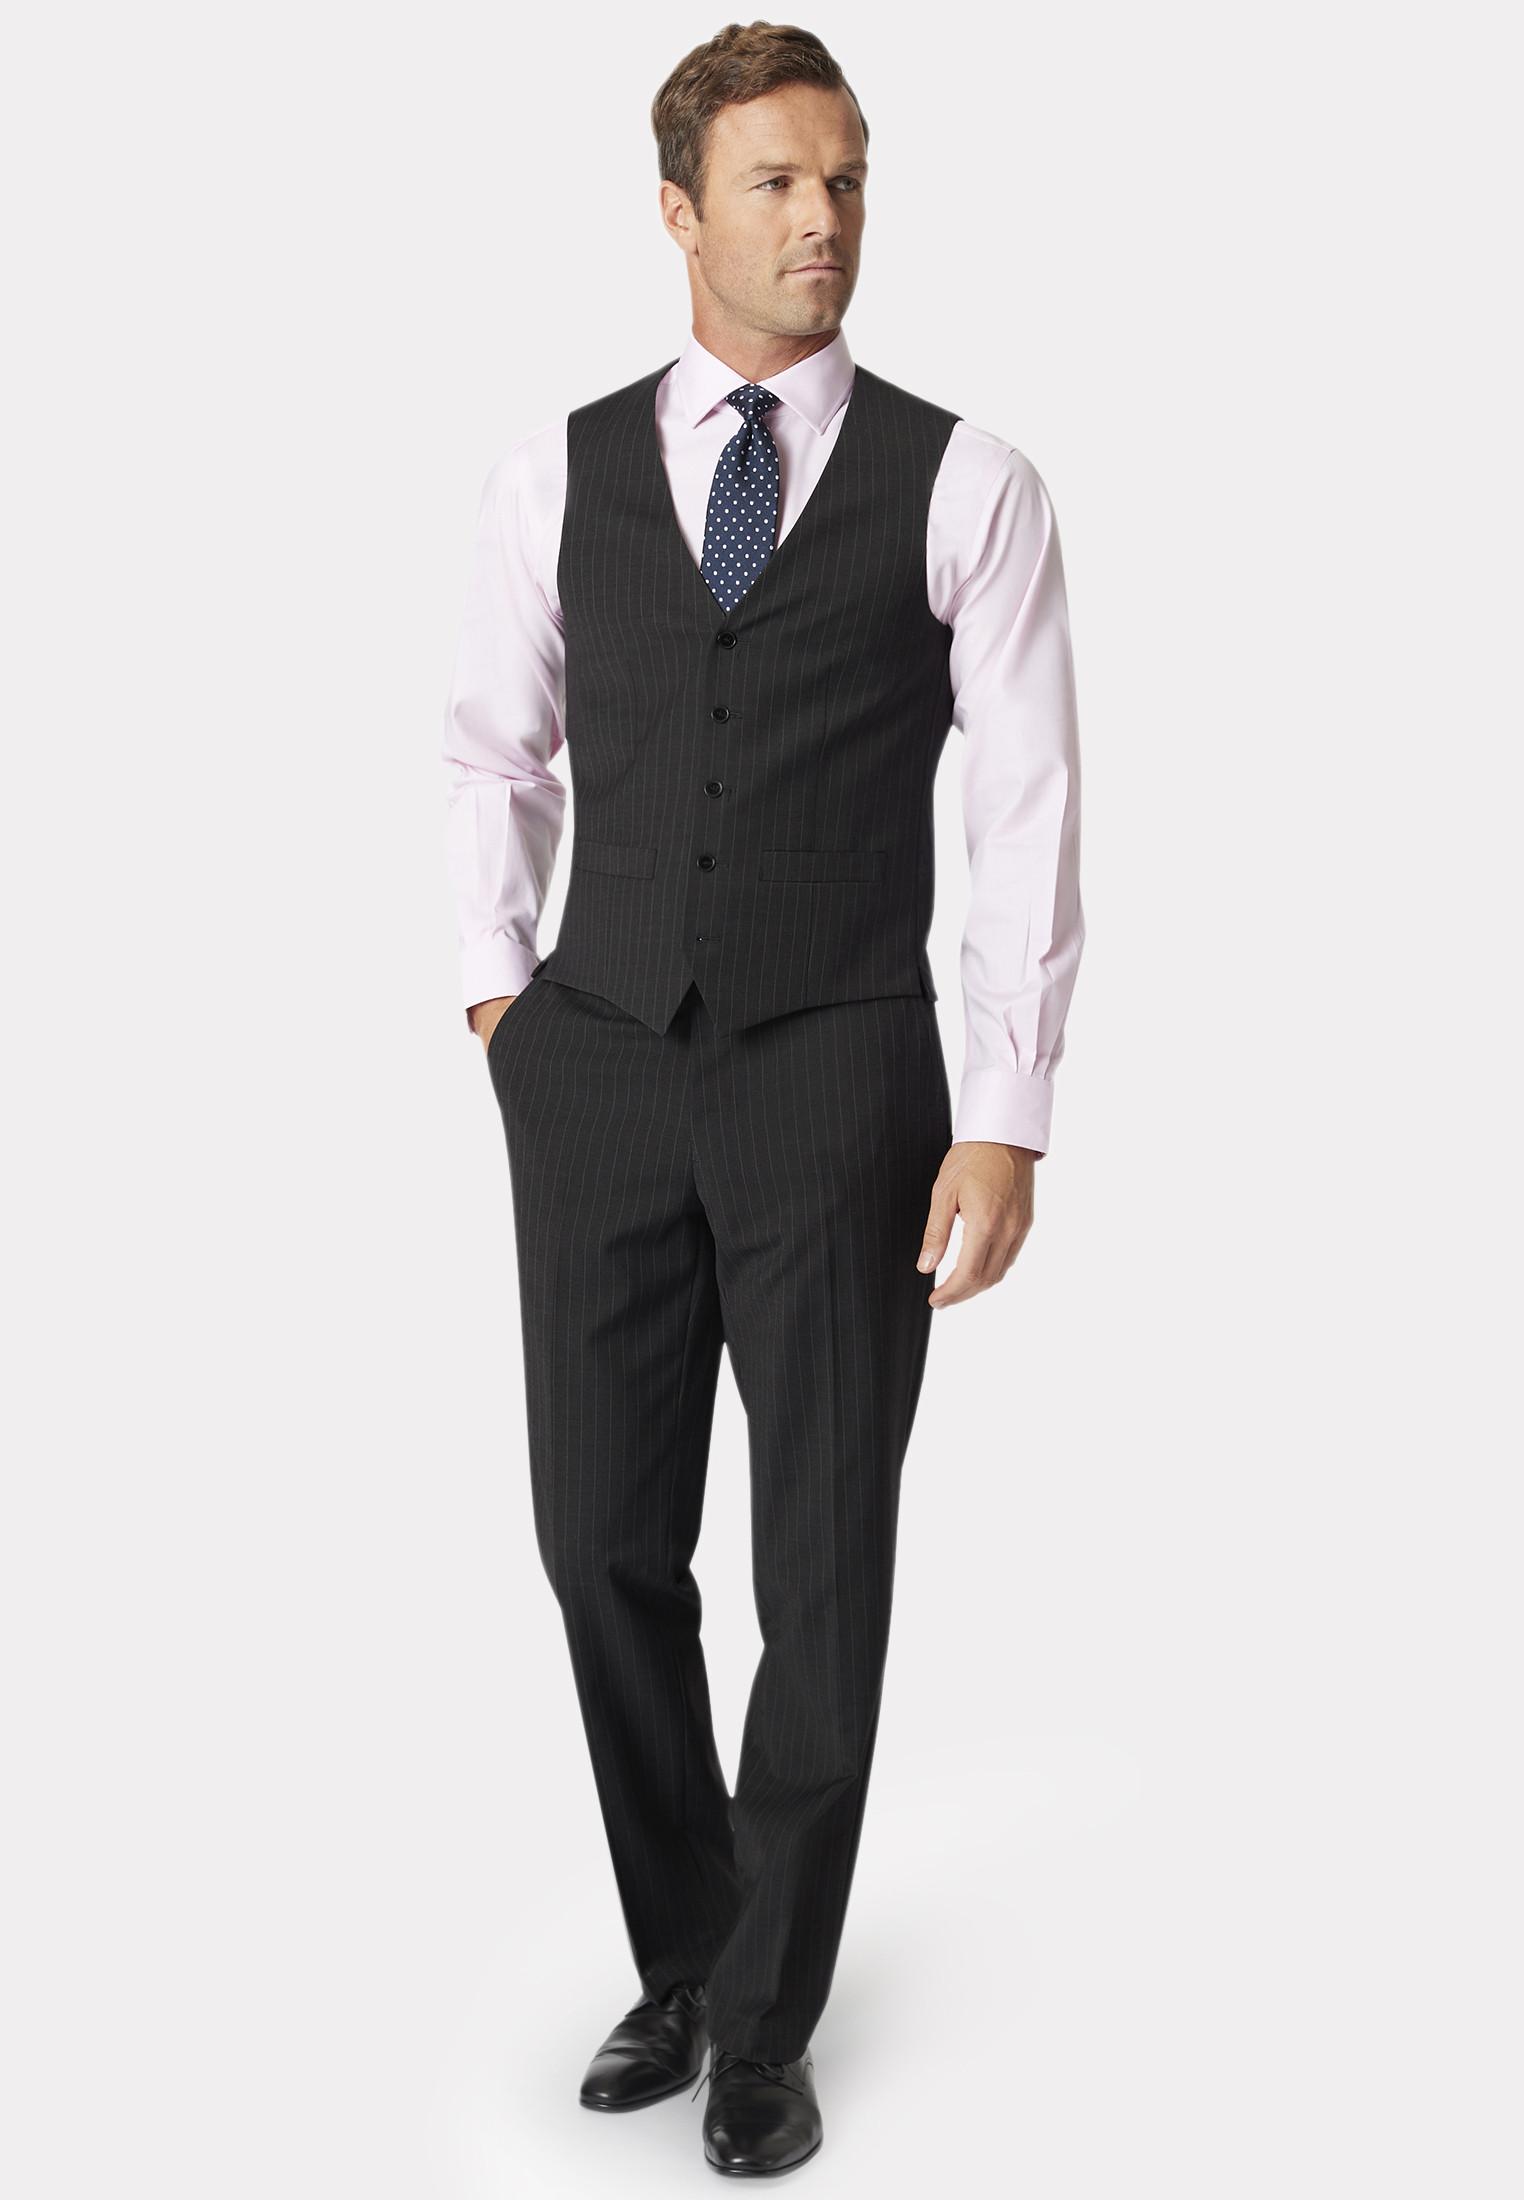 Avalino Charcoal Pinstripe Three Piece Travel Suit - Waistcoat Optional